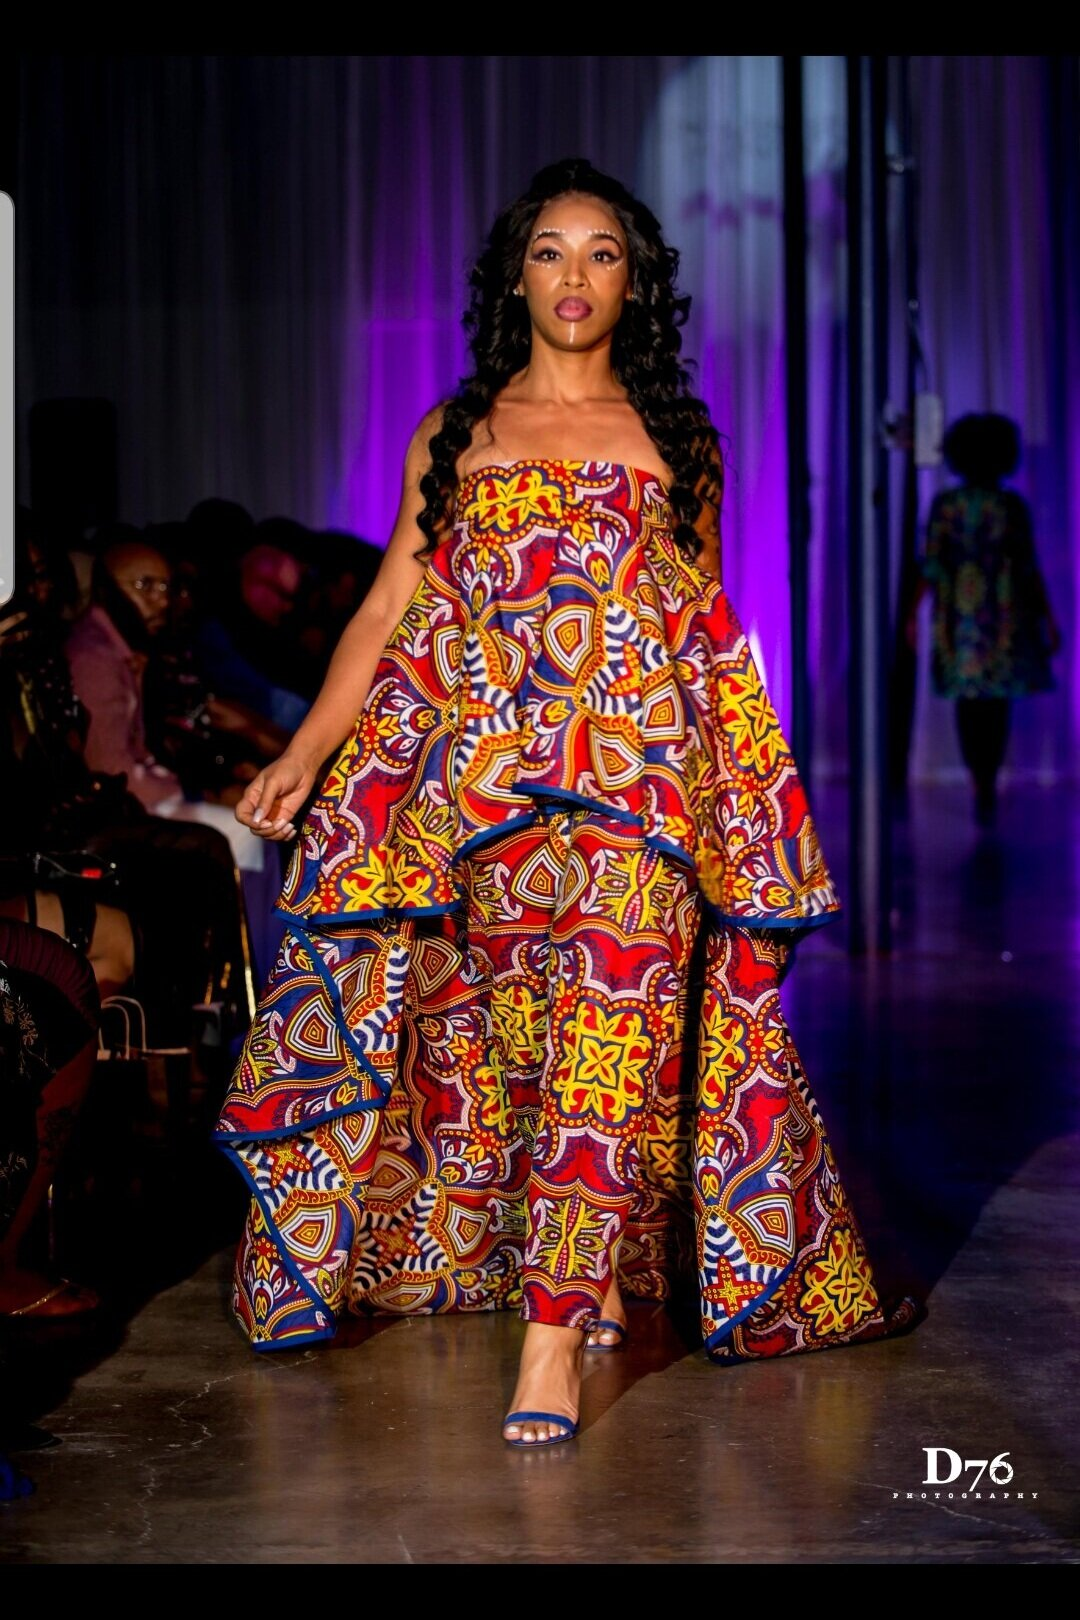 Kymareo - Fashion Show: Kitoko| Fashion Designer | | Seamstress | design by KymareoCountry of origin/country represented: United States of America